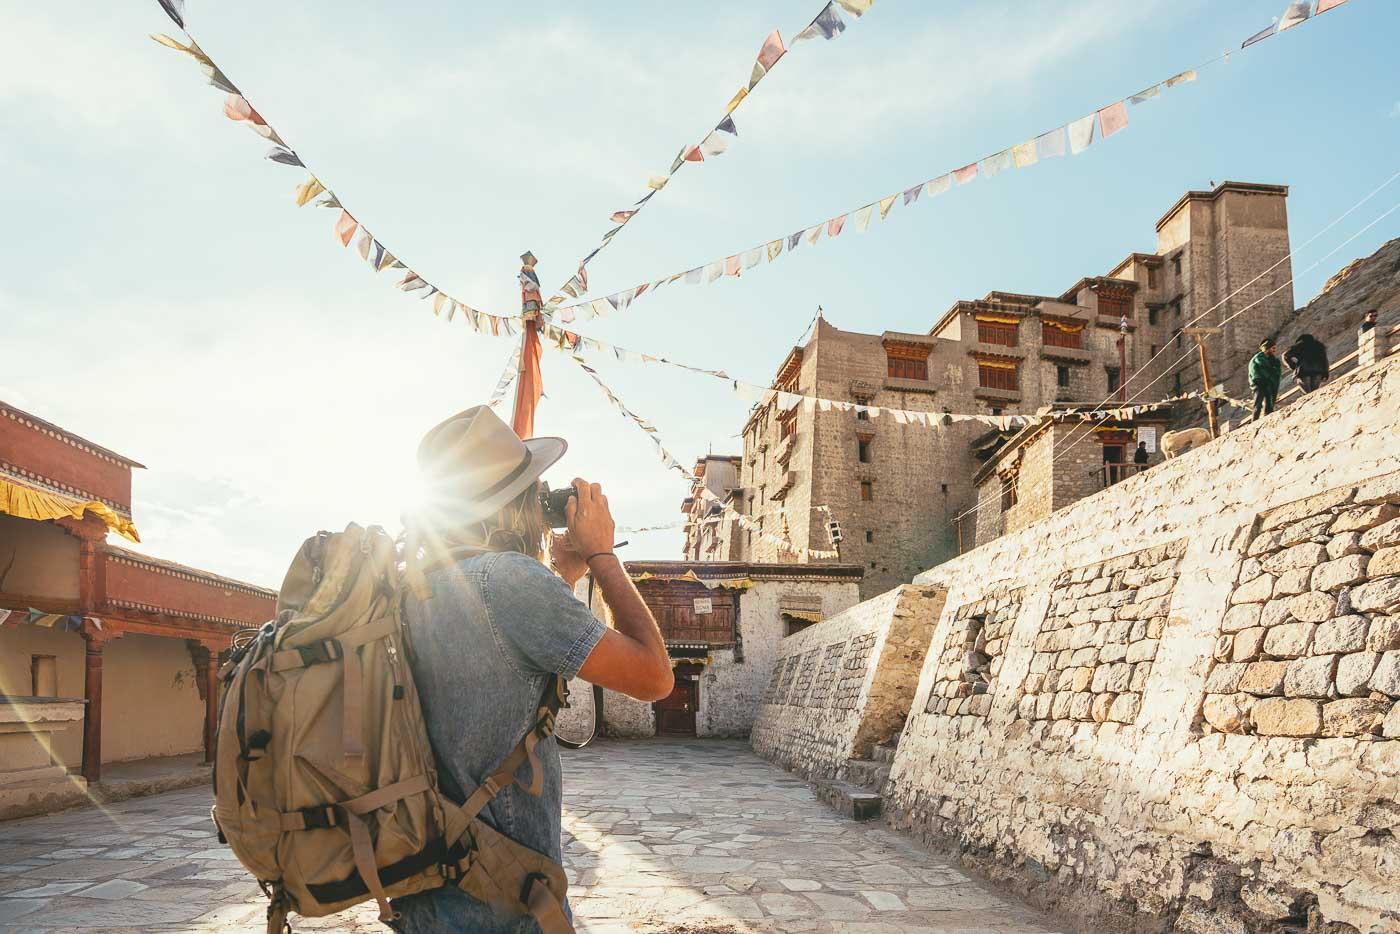 Photographer Stefan Haworth taking photos of Monastery in Ladakh India